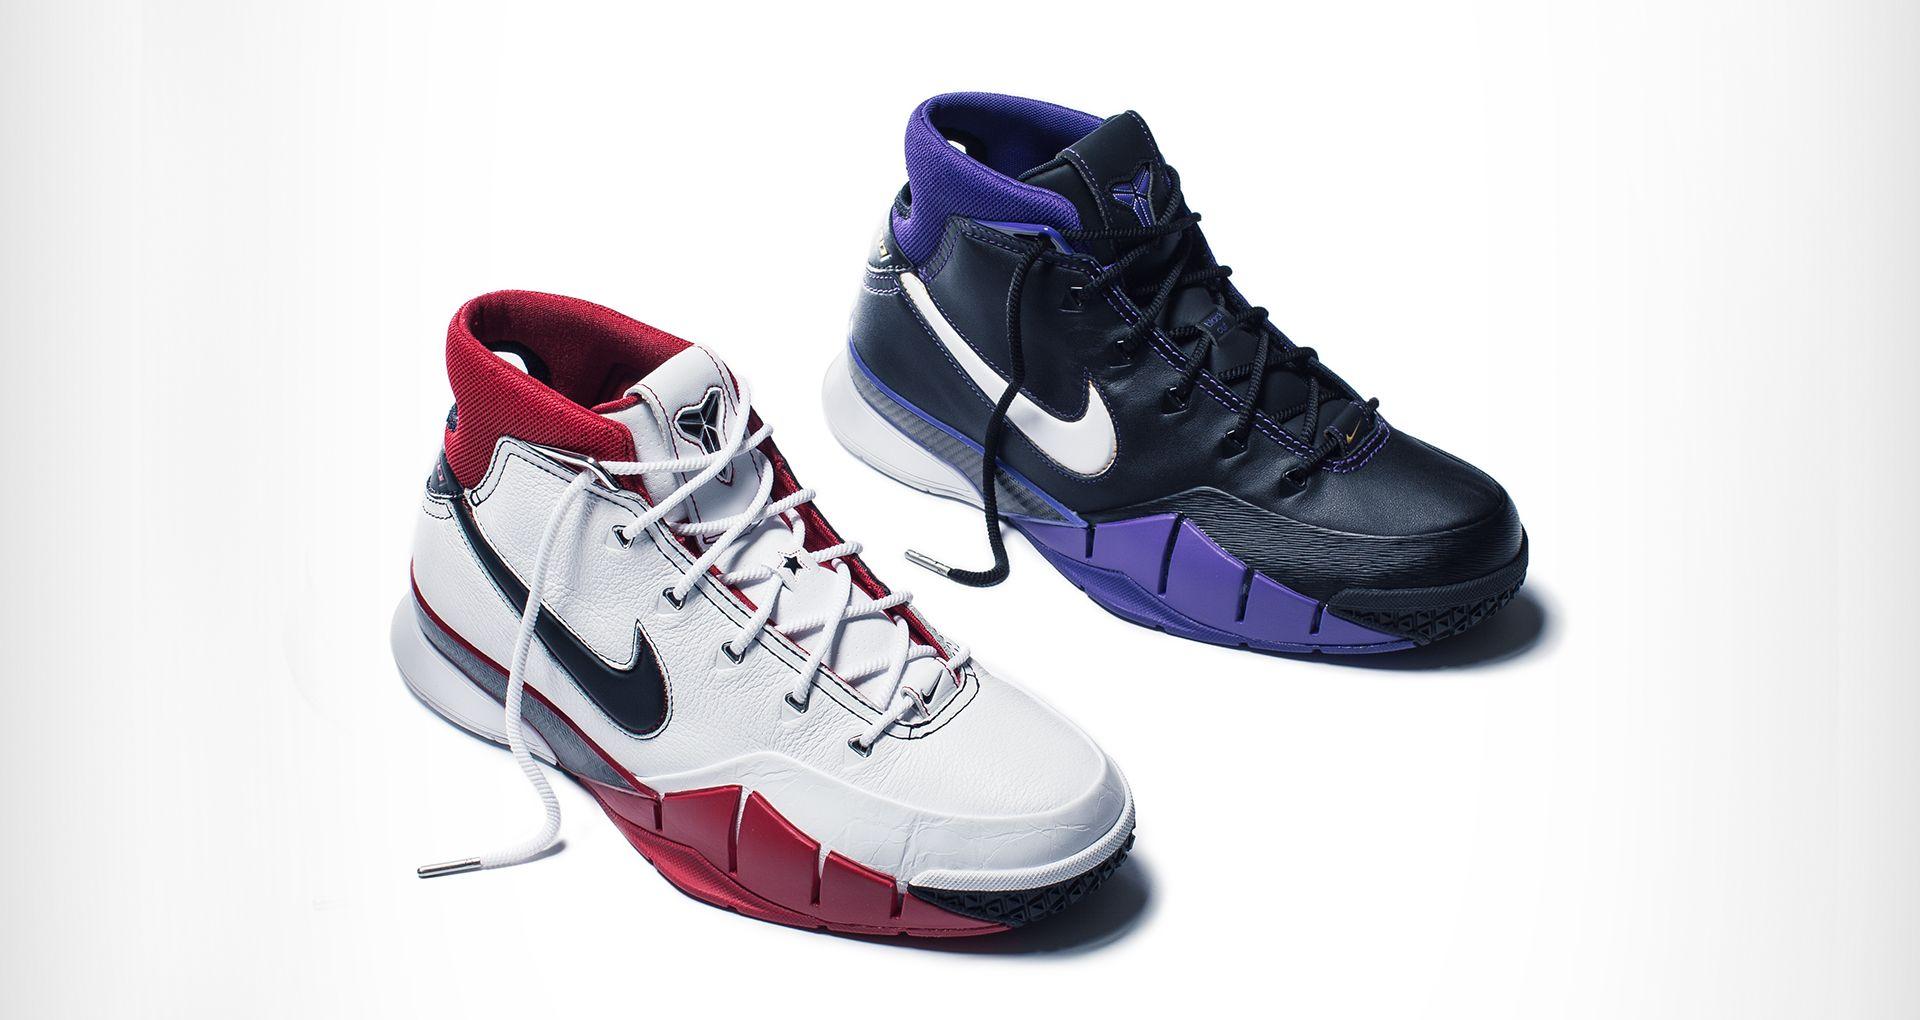 size 40 5001c 12df1 Nike Zoom Kobe 1 Protro February 17th 2018   Page 98   NikeTalk